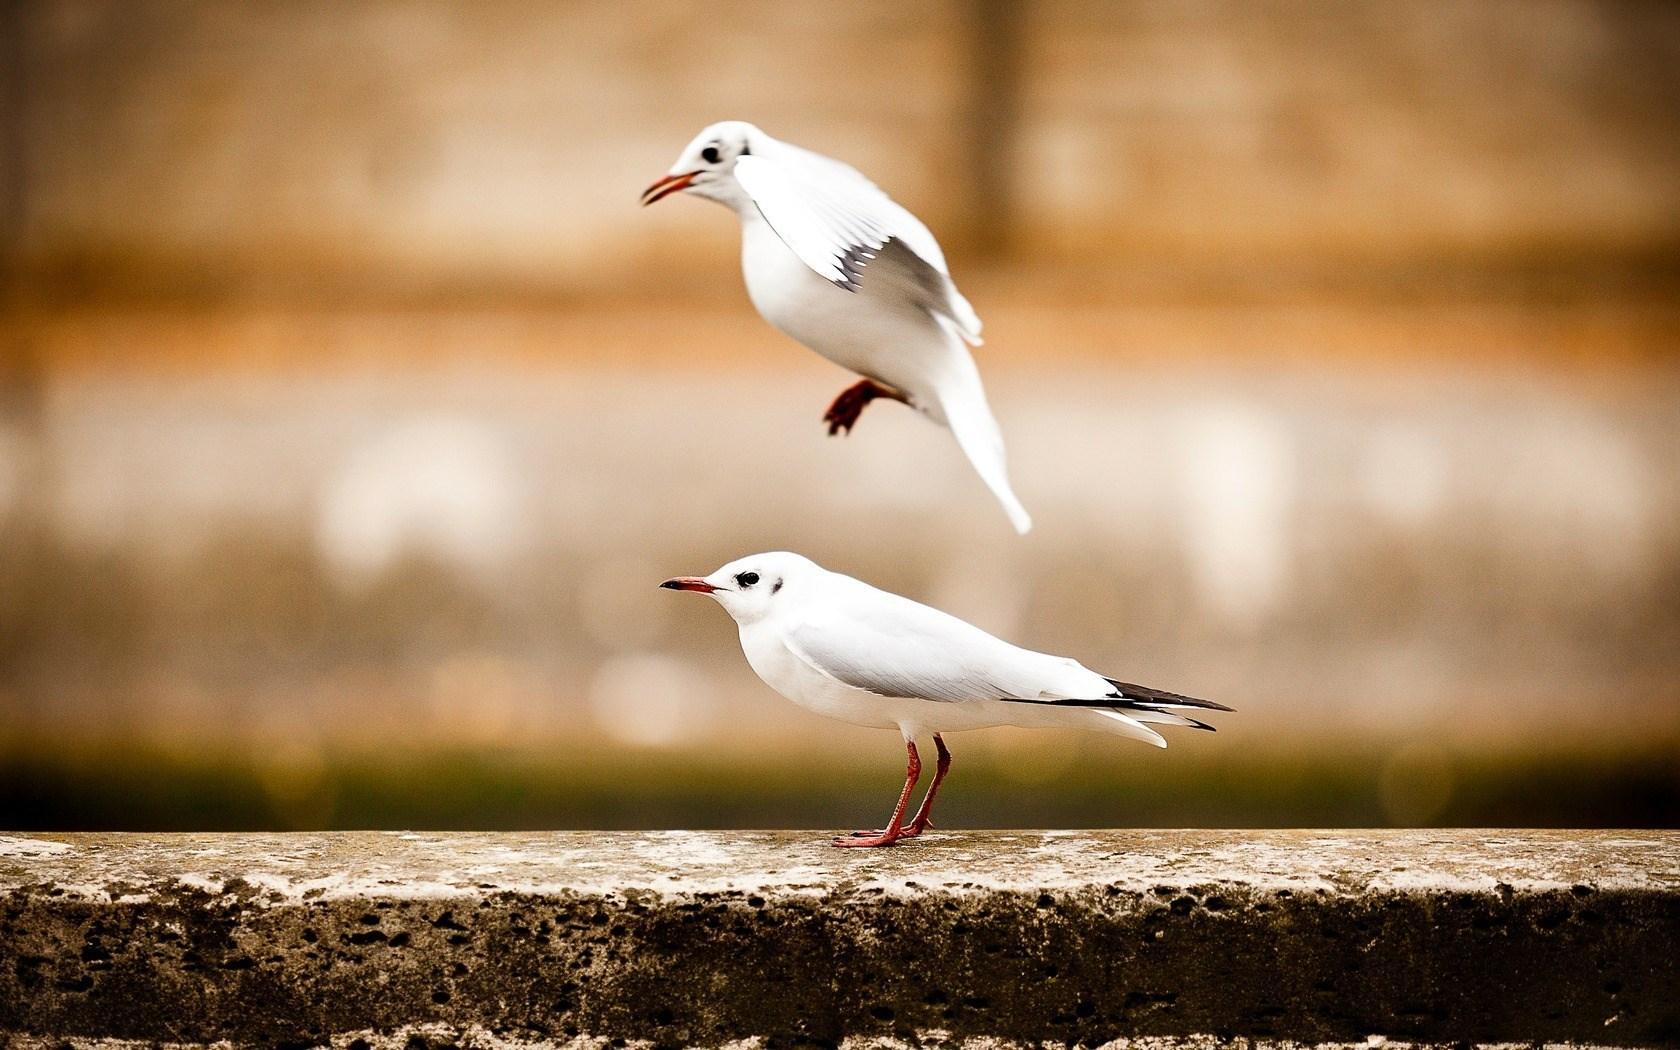 Two Birds Seagulls